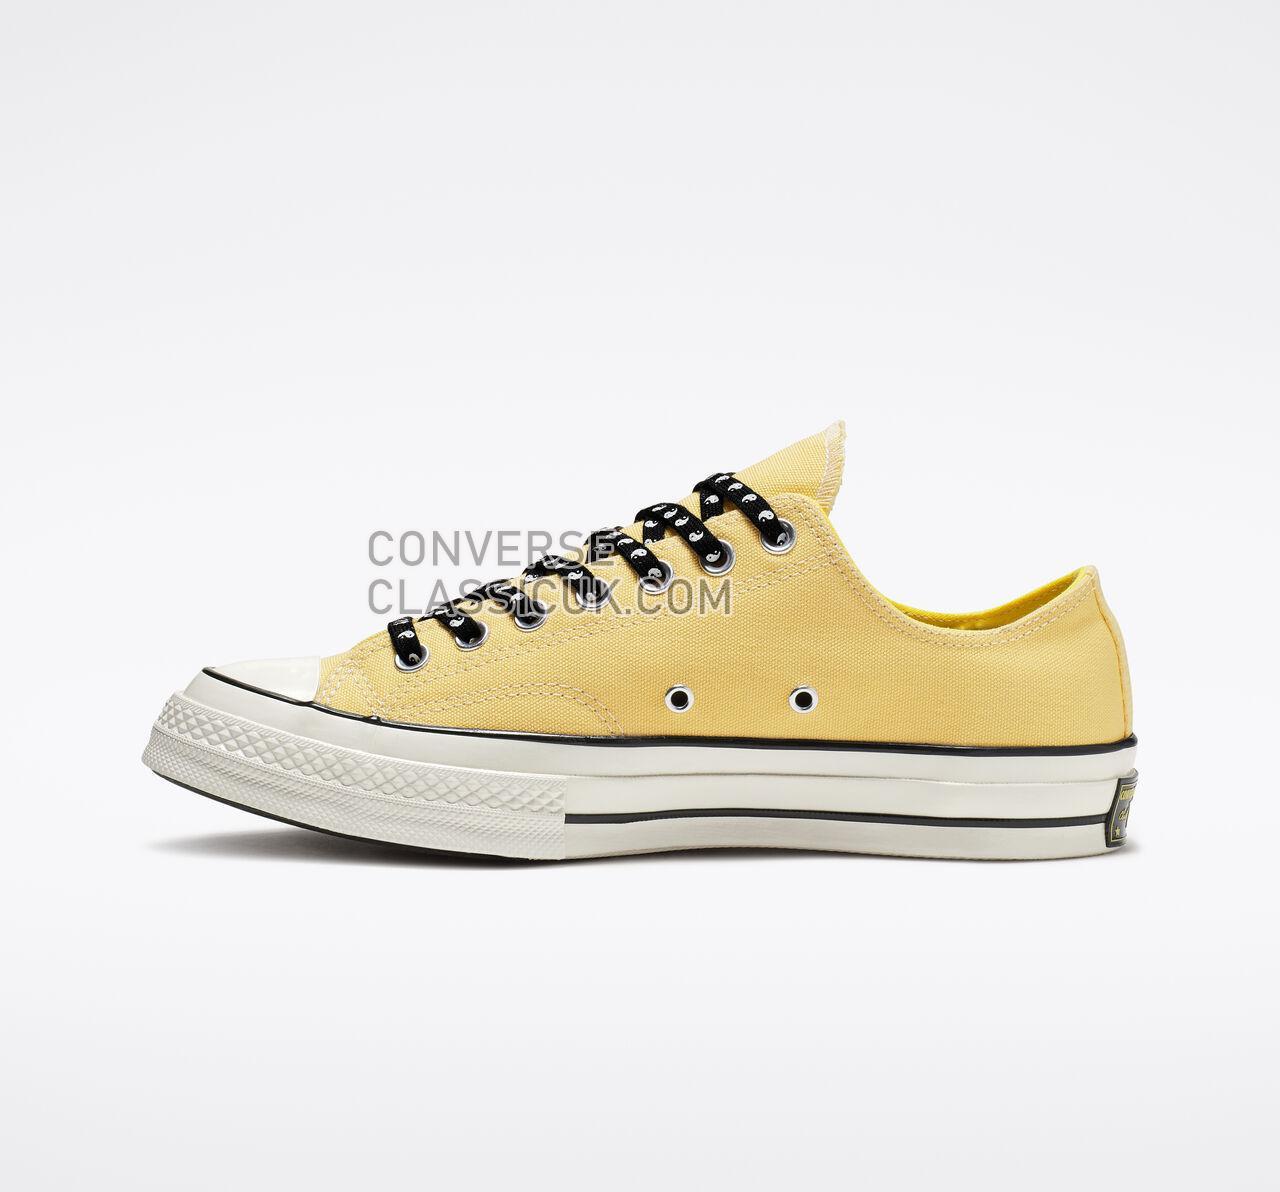 Converse Chuck 70 Psy-Kicks Low Top Mens Womens Unisex 164214C Butter Yellow/Fresh Yellow Shoes